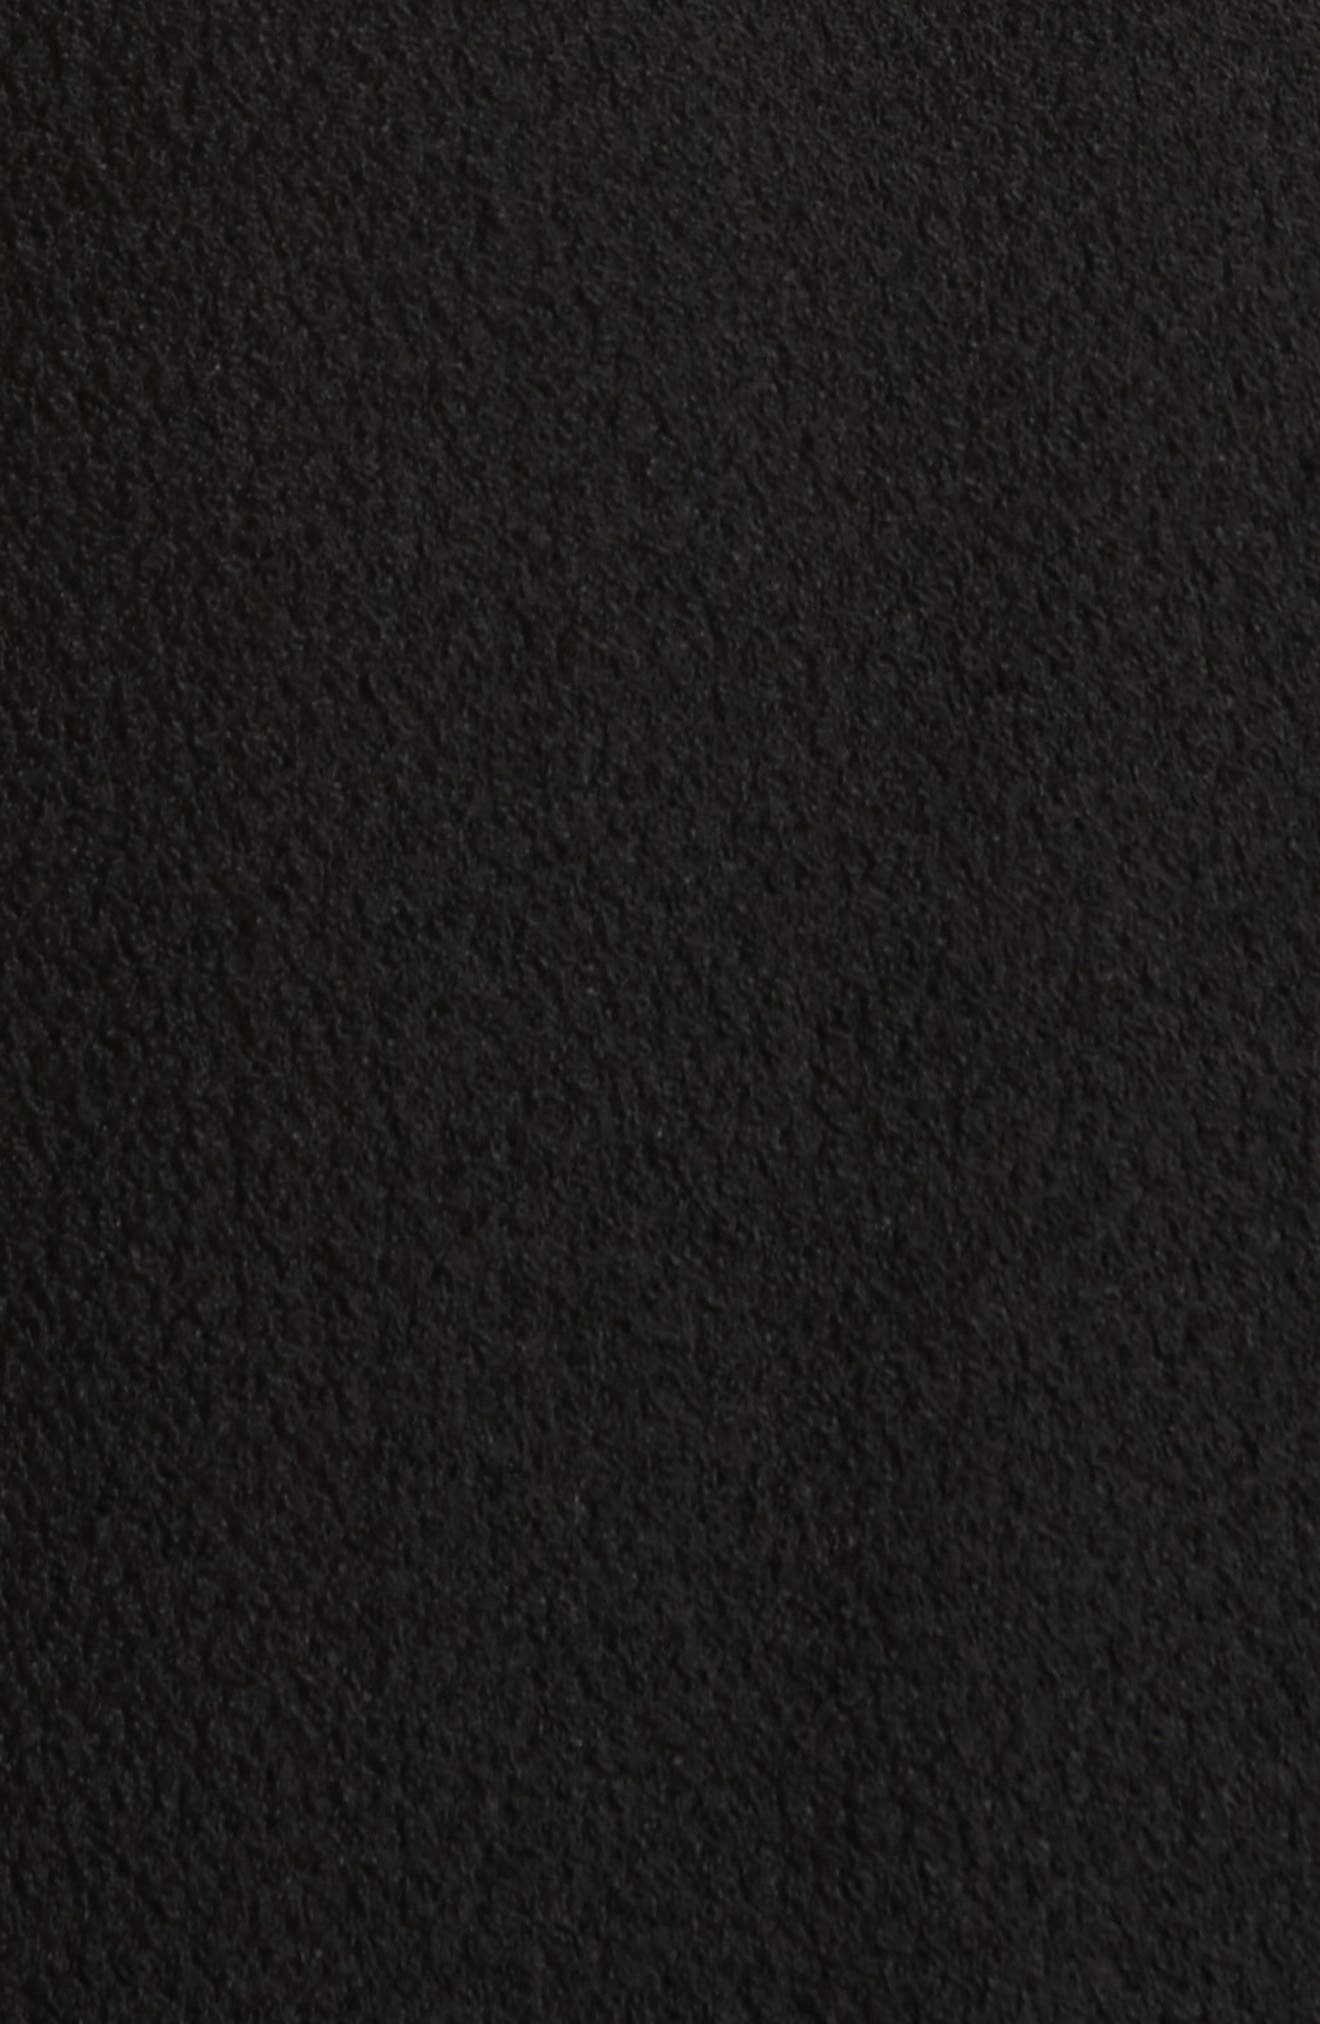 Maude Ruffle Panel Crepe Skirt,                             Alternate thumbnail 5, color,                             001